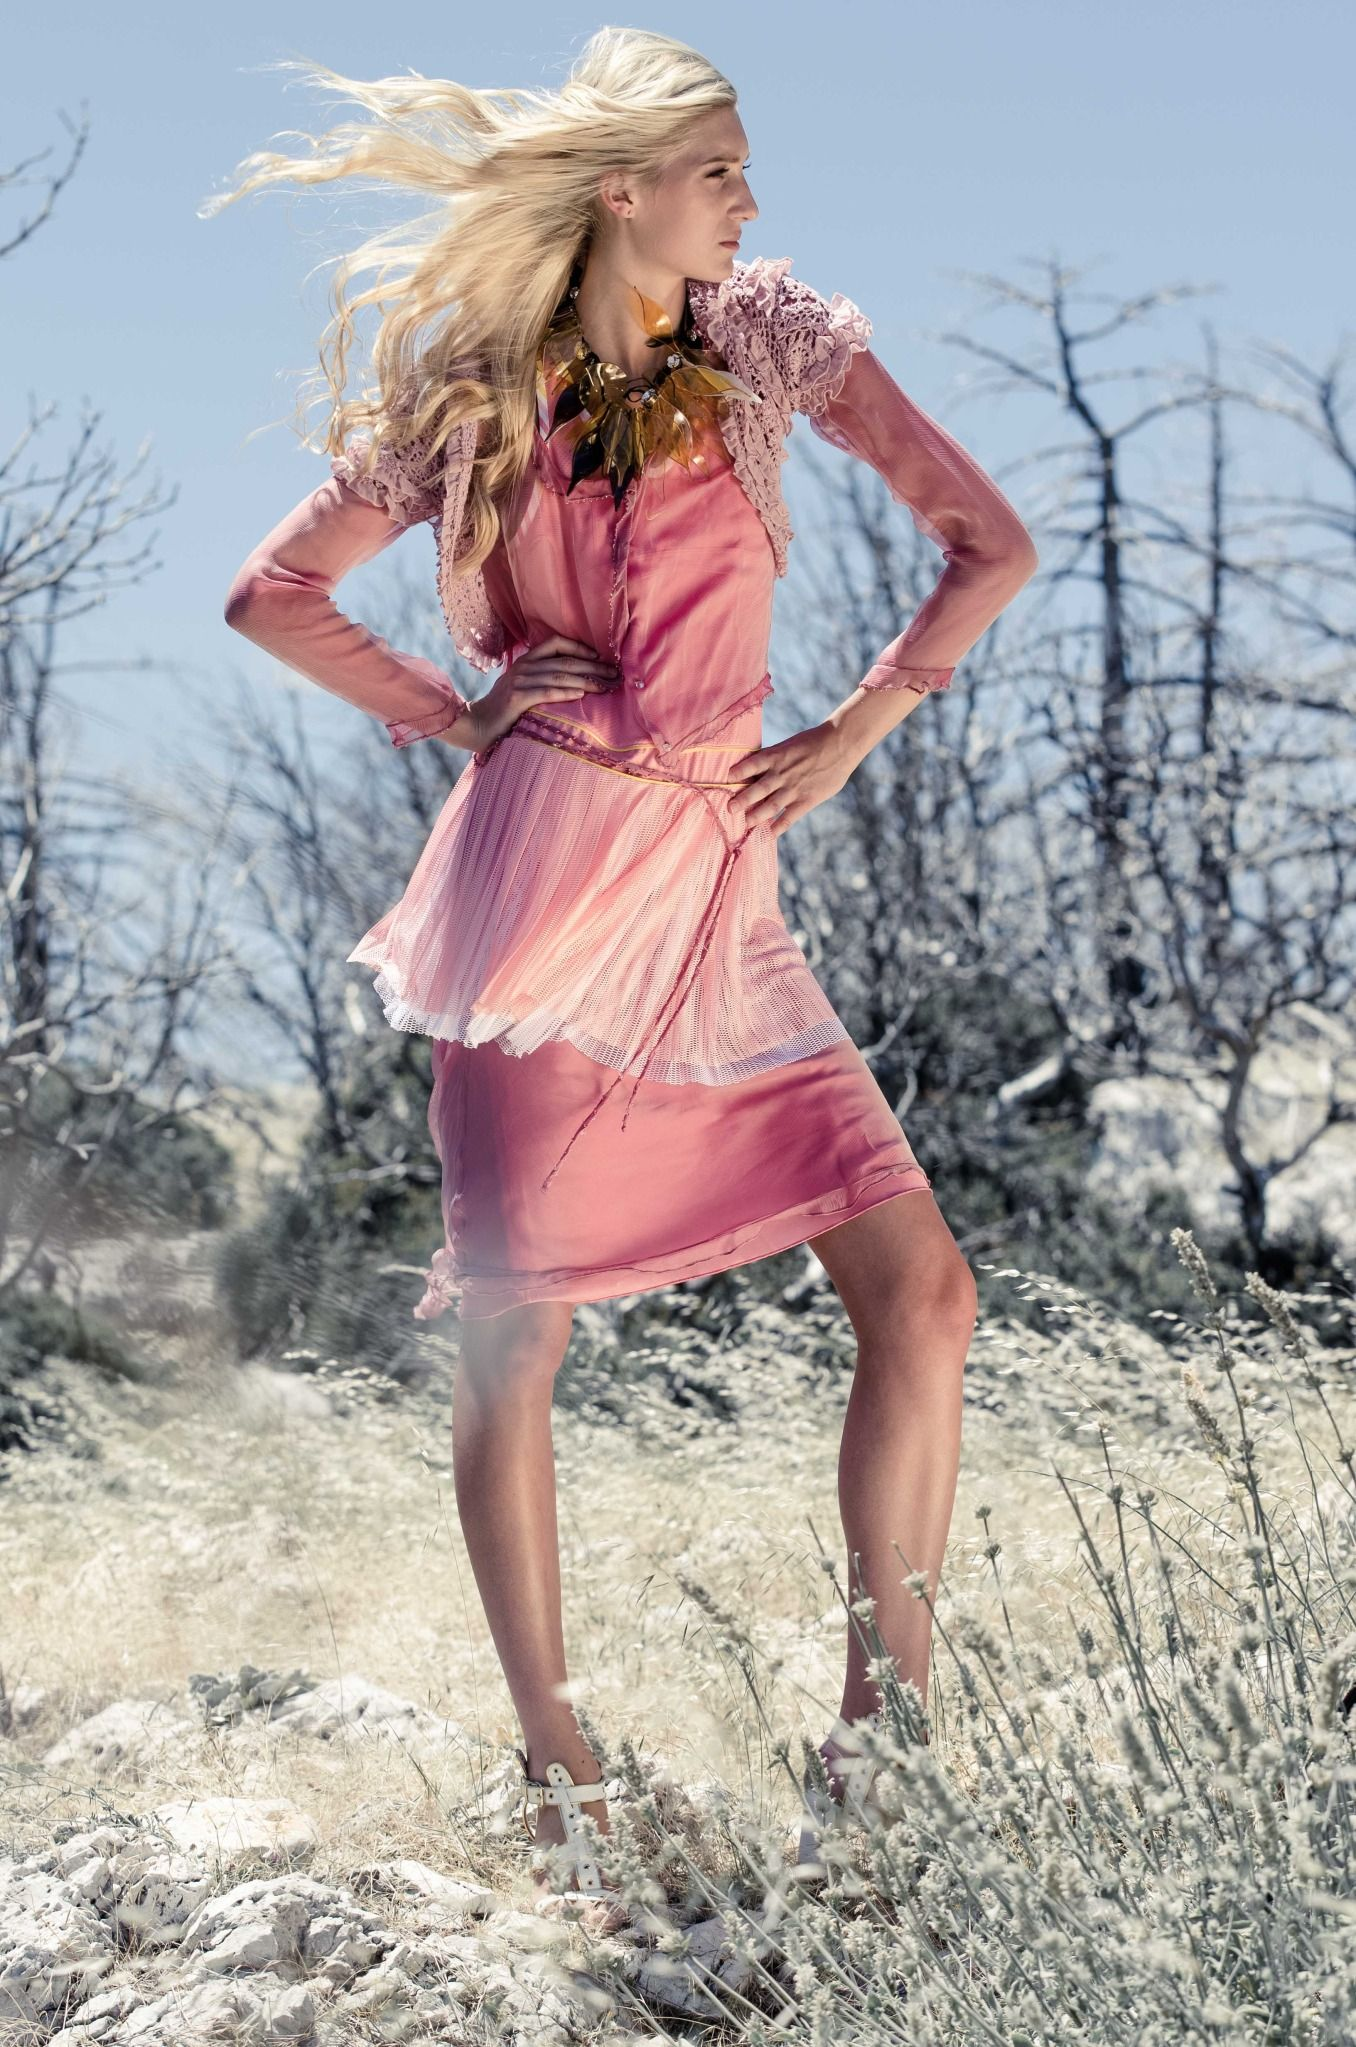 Cloudline Chic Ροές | My Style | Pinterest